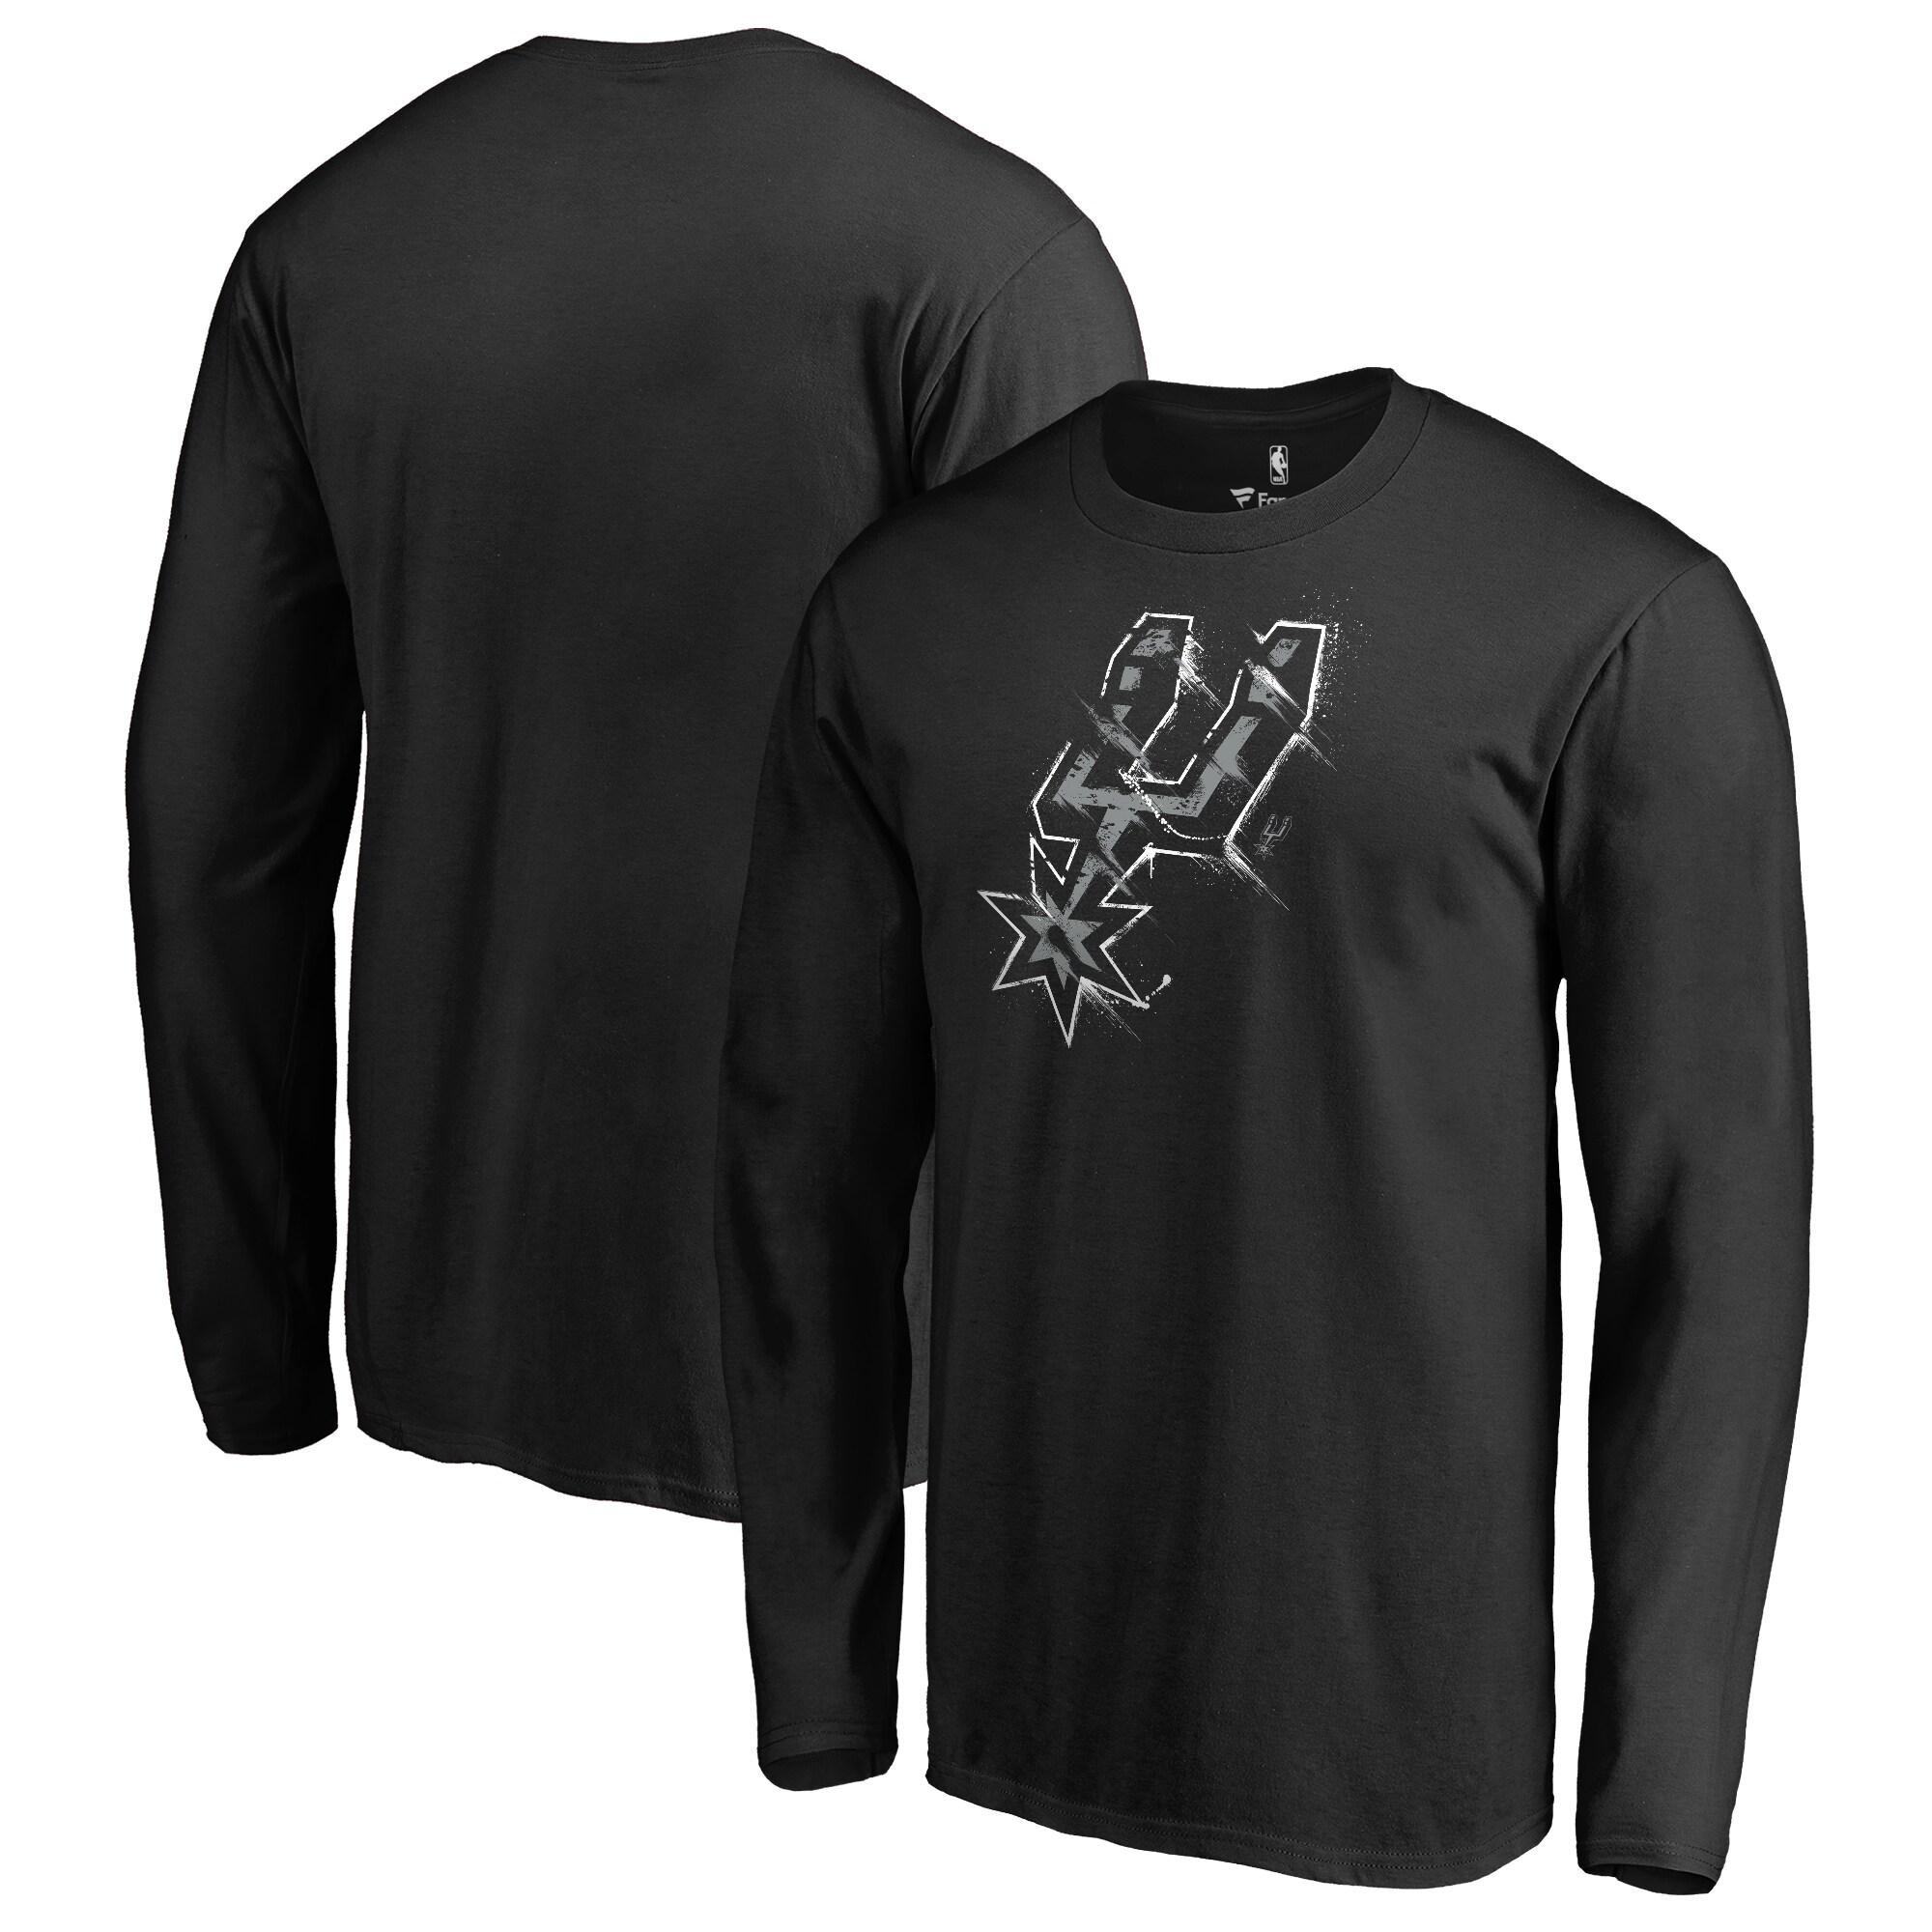 San Antonio Spurs Fanatics Branded Splatter Logo Long Sleeve T-Shirt - Black